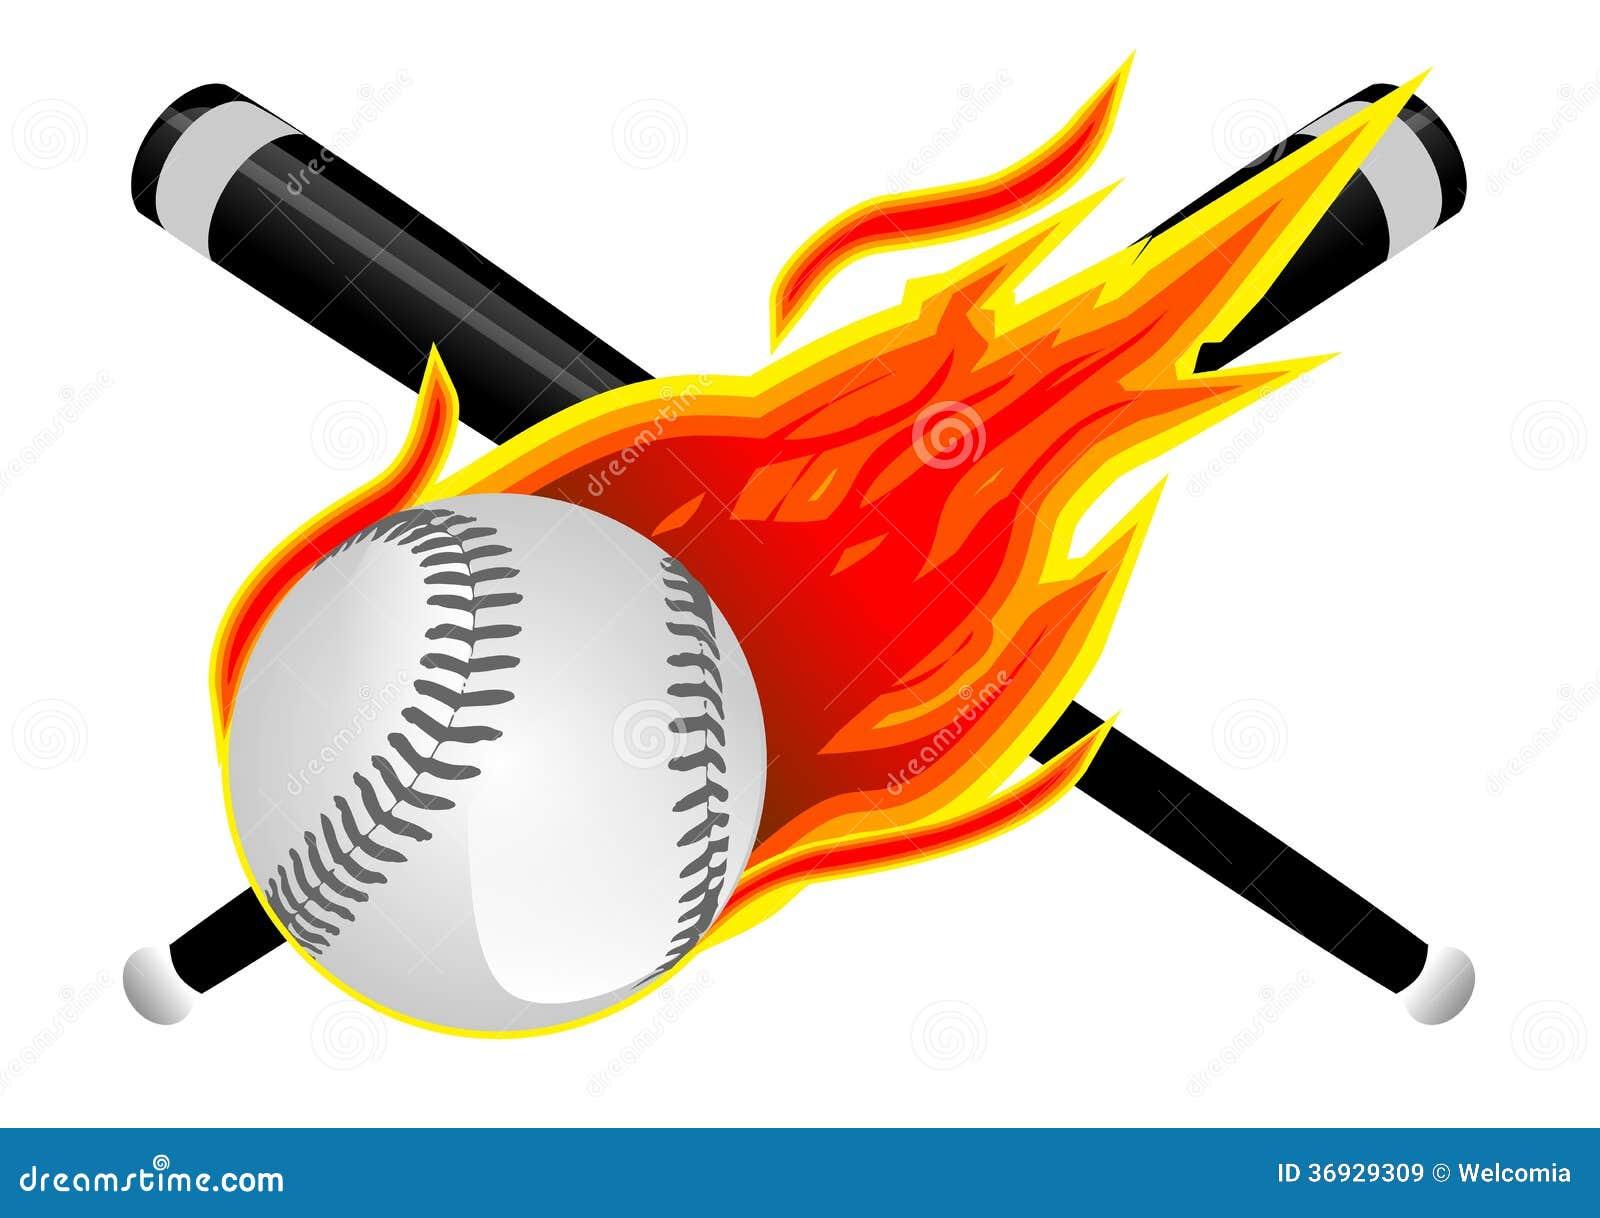 baseball flames stock illustrations 100 baseball flames stock rh dreamstime com Happy Birthday Nature Clip Art Baseball Border Clip Art